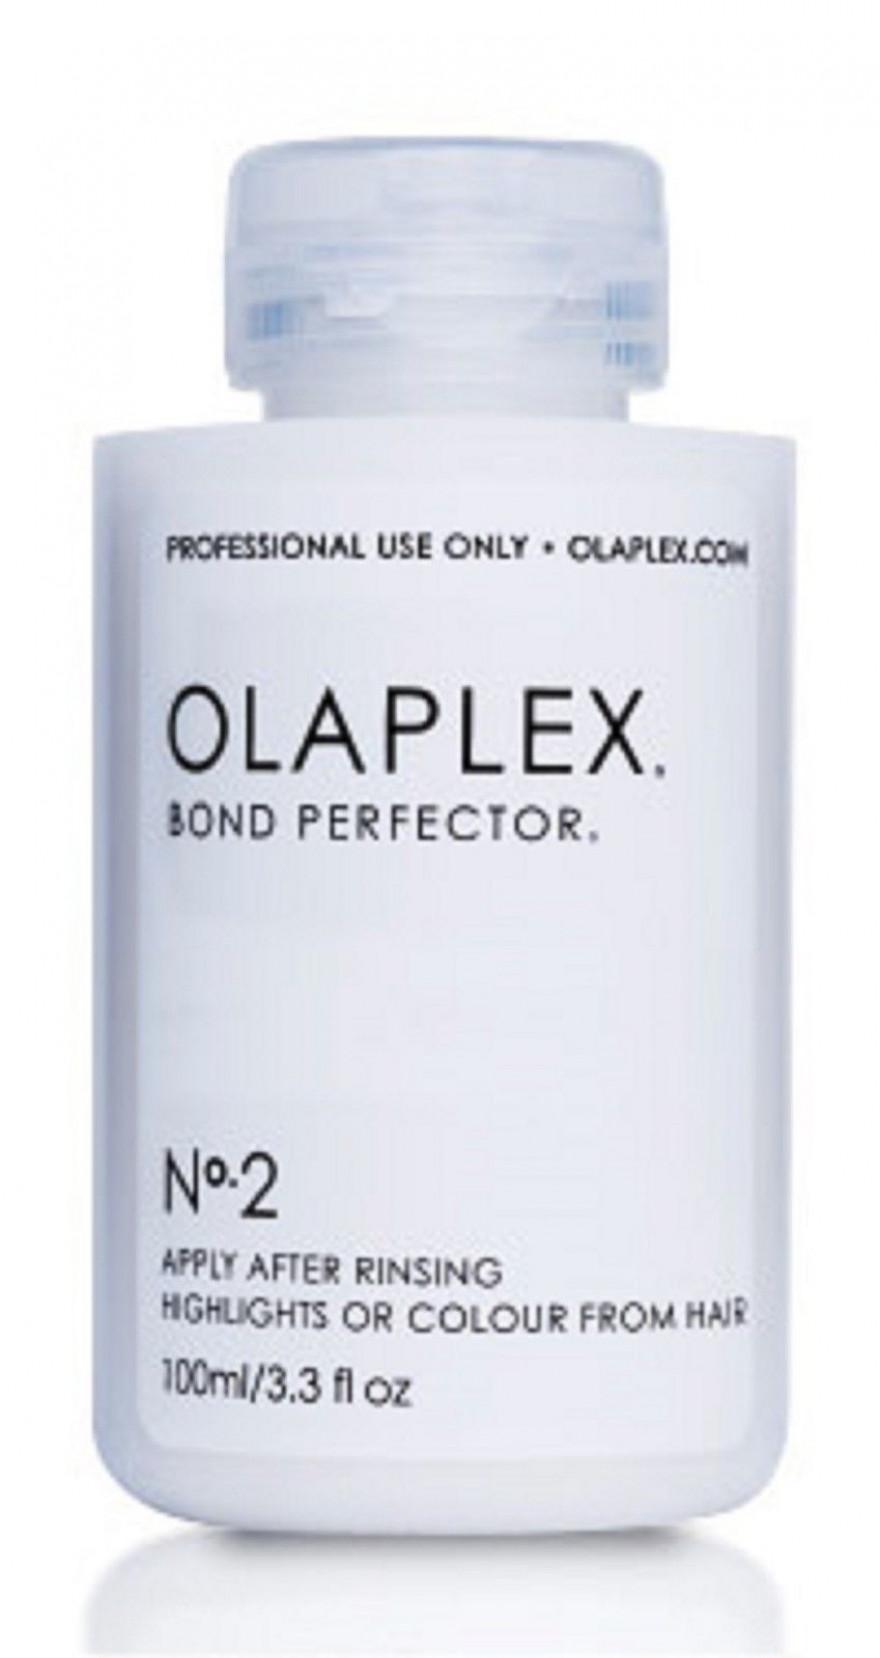 Olaplex 2.jpg